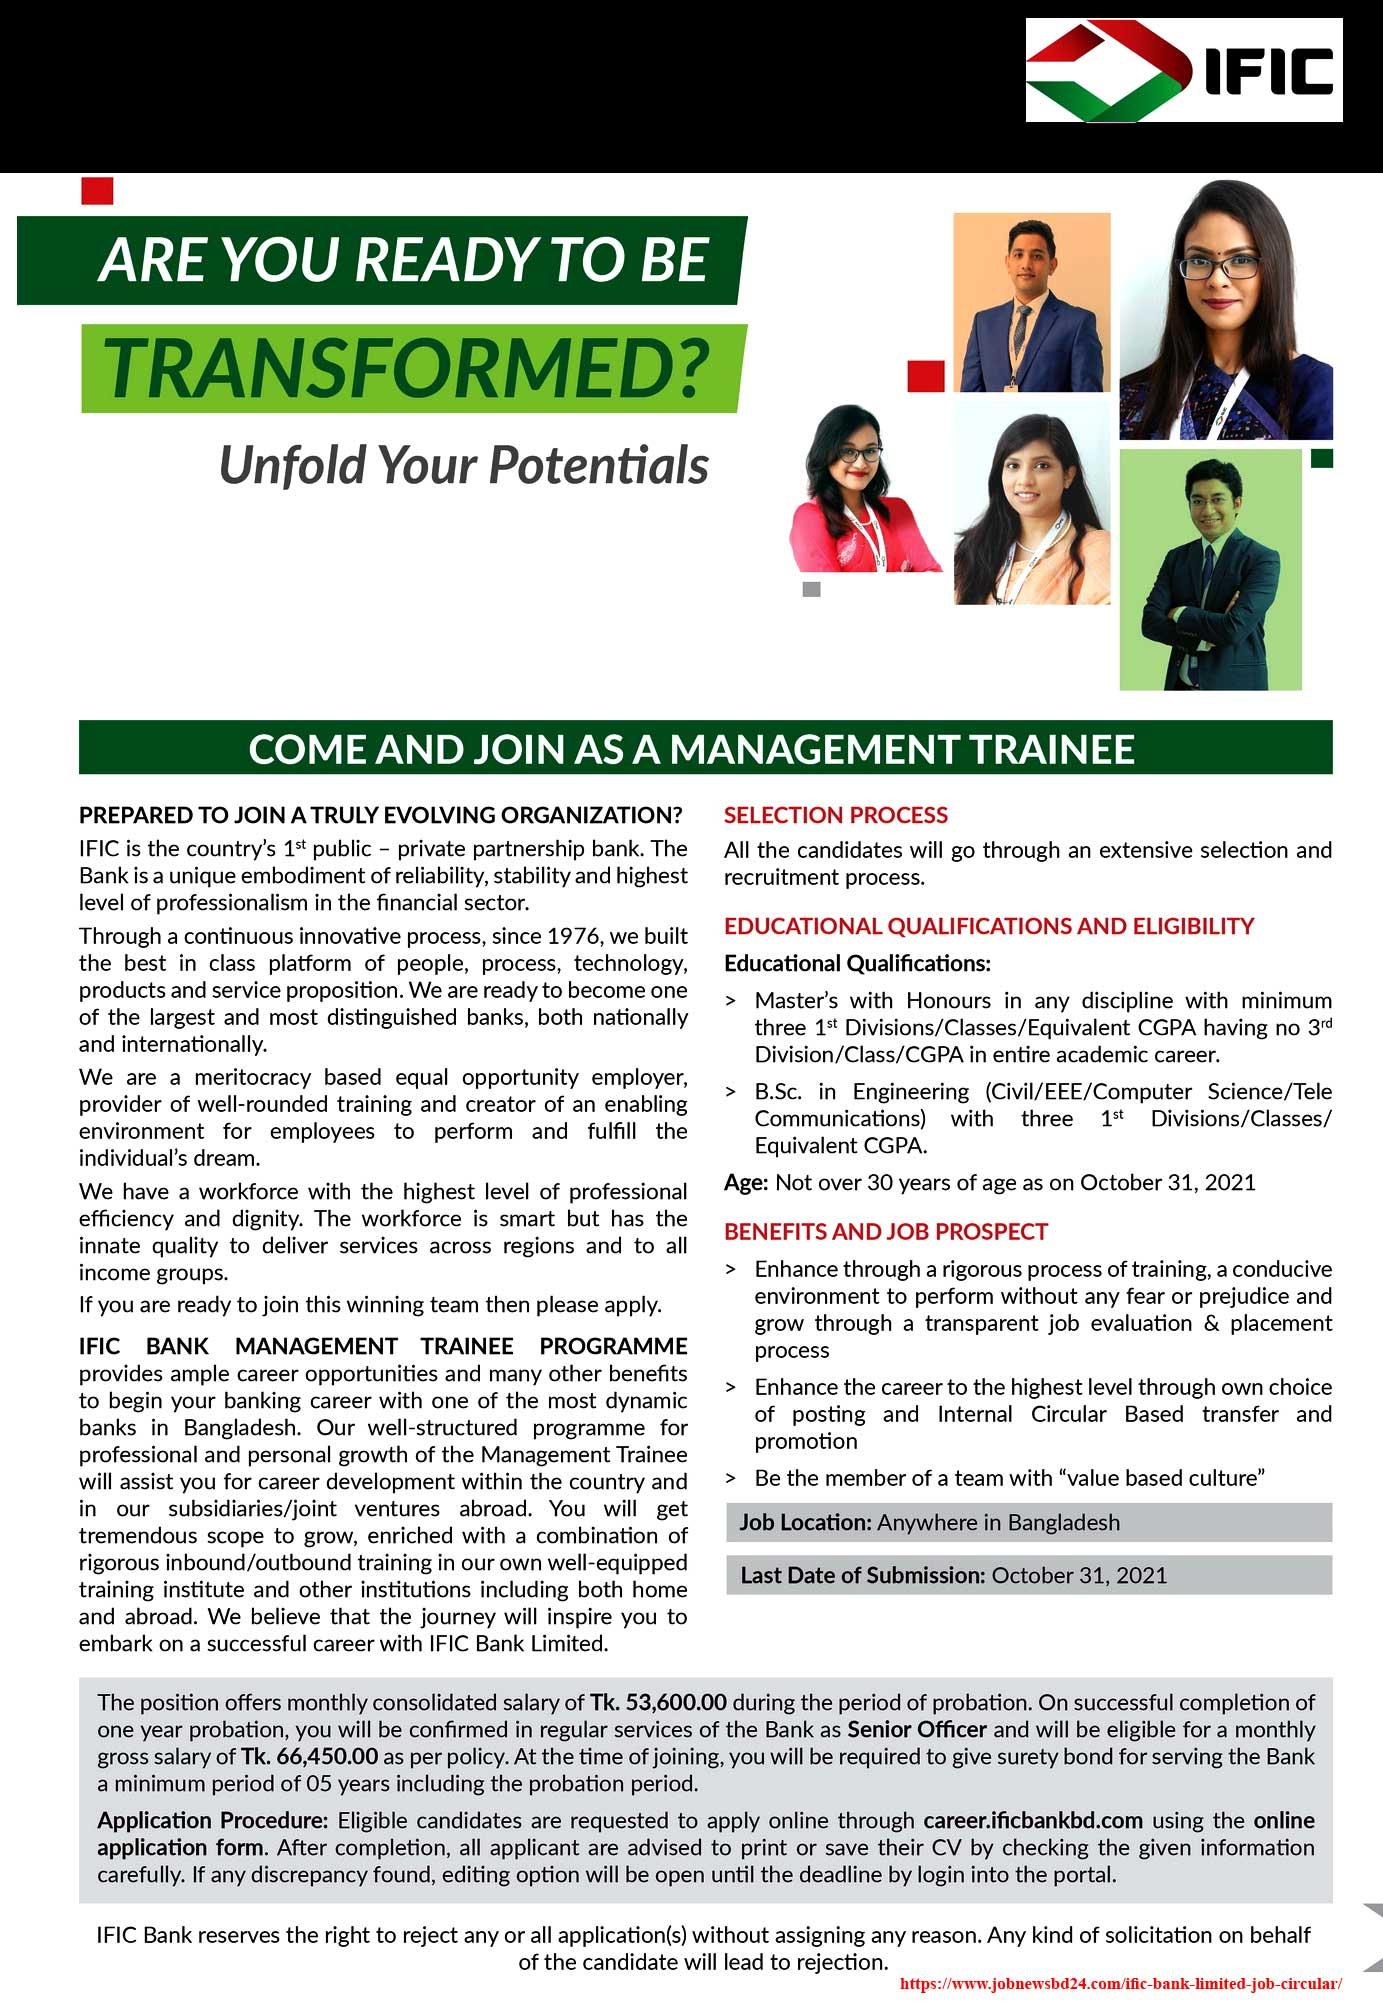 IFIC Bank MTO Application